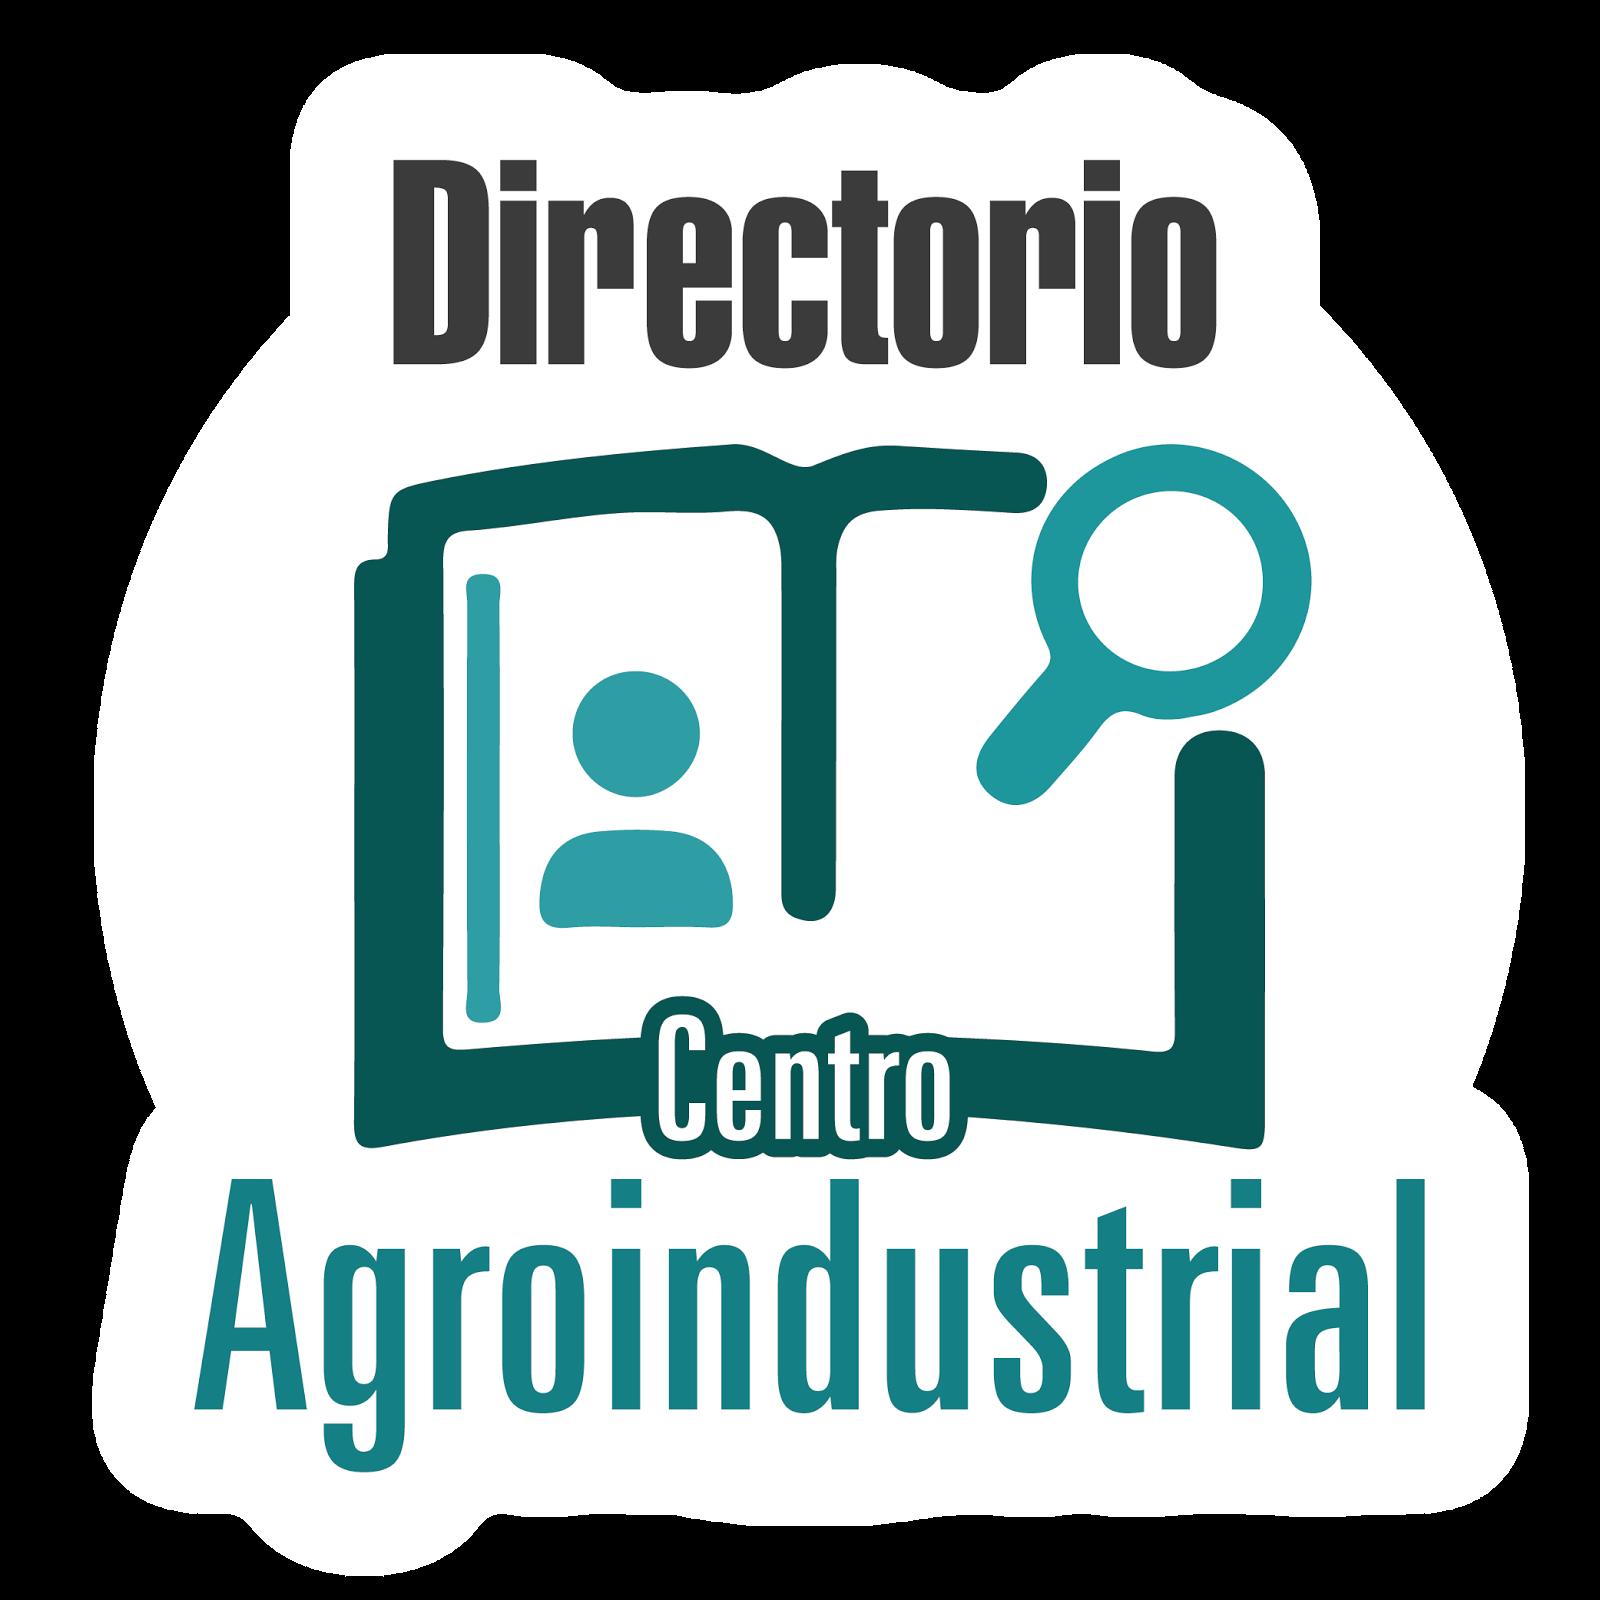 Directorio Centro Agroindustrial